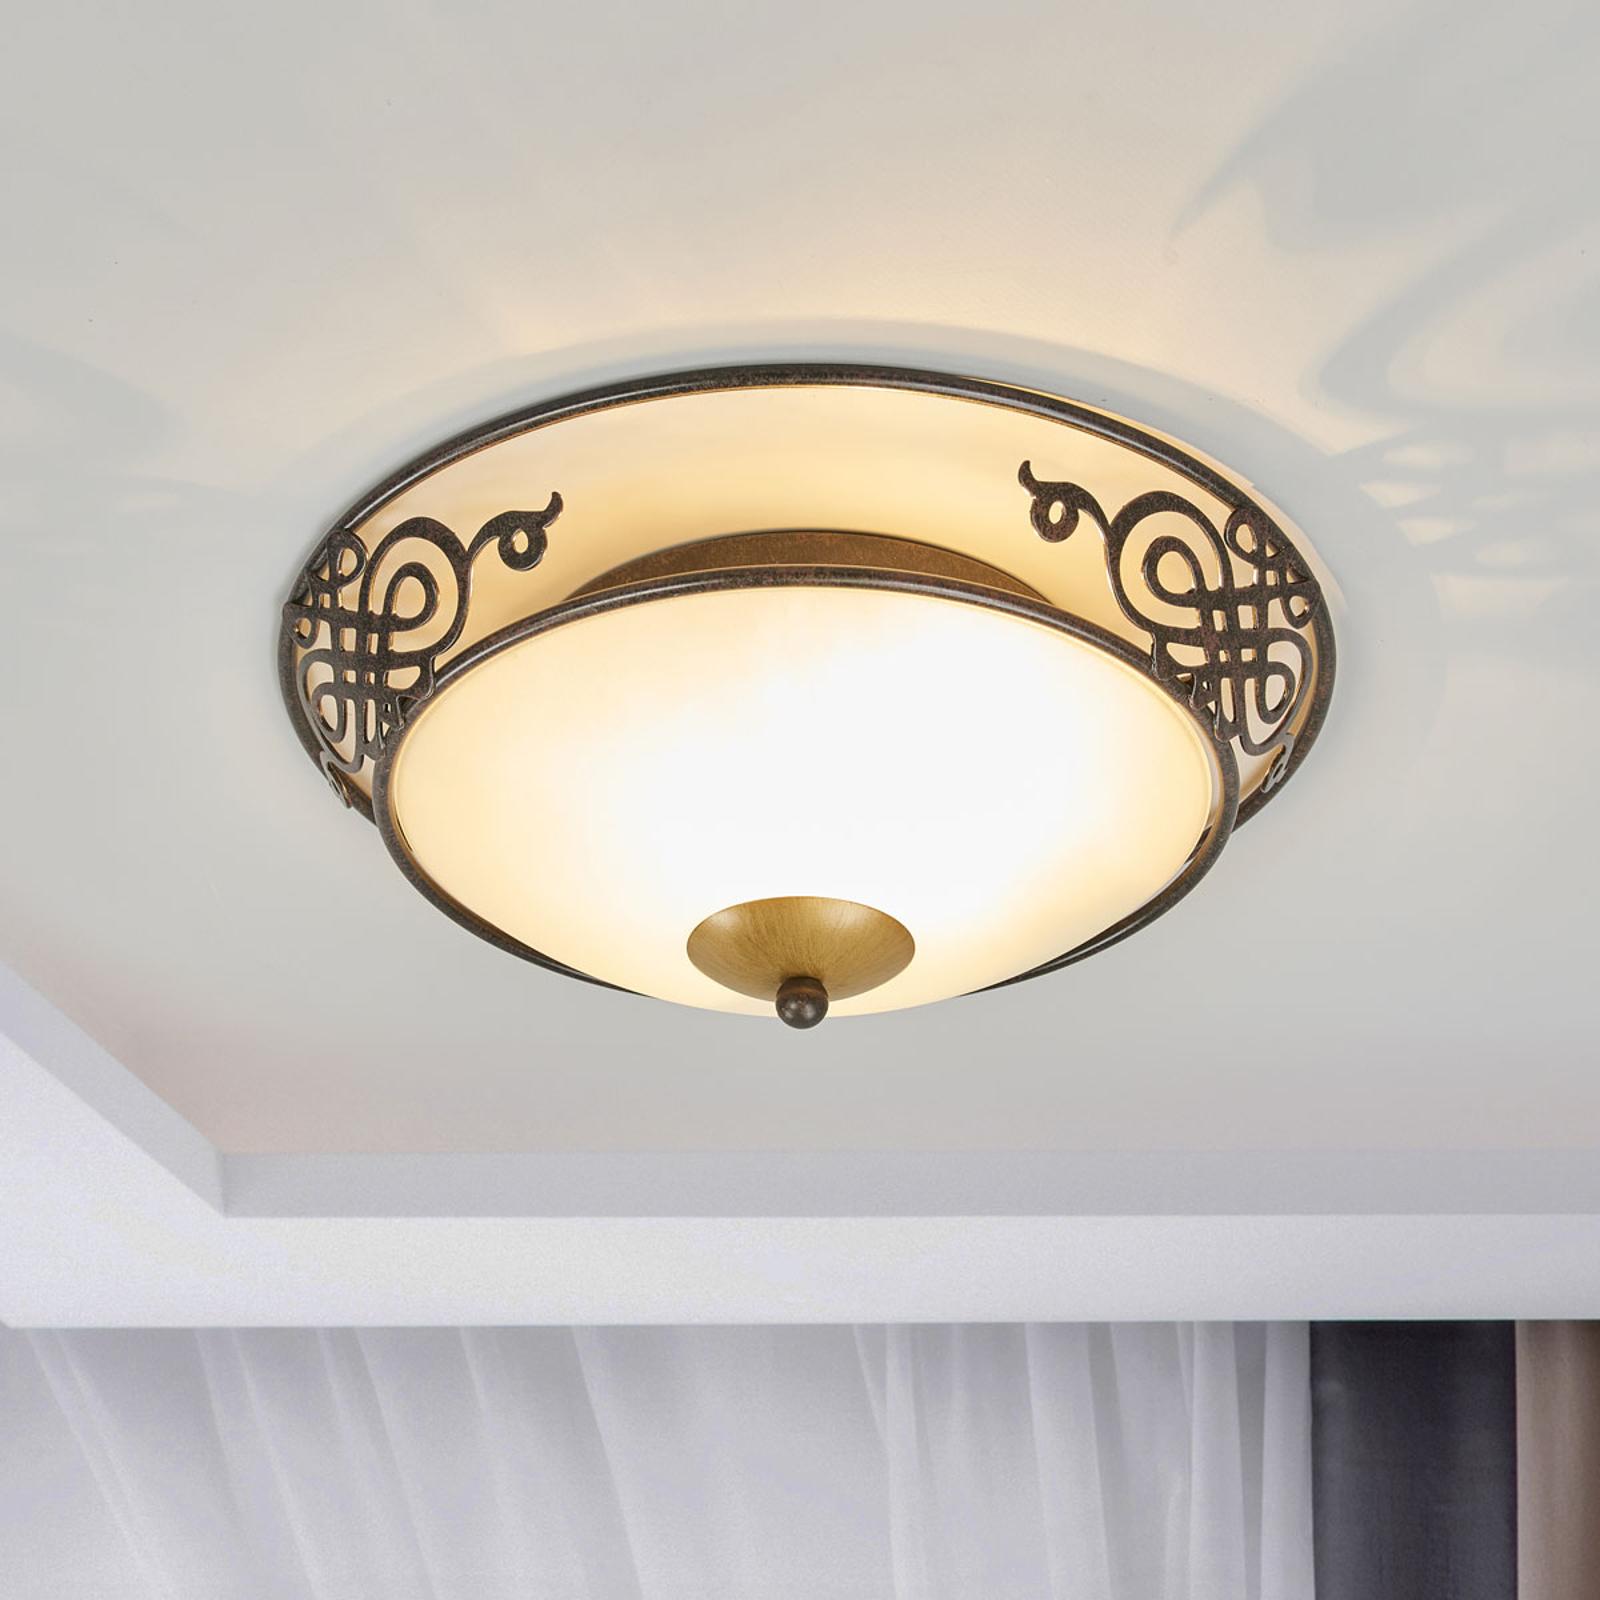 Rustic ceiling light Master_3001264_1